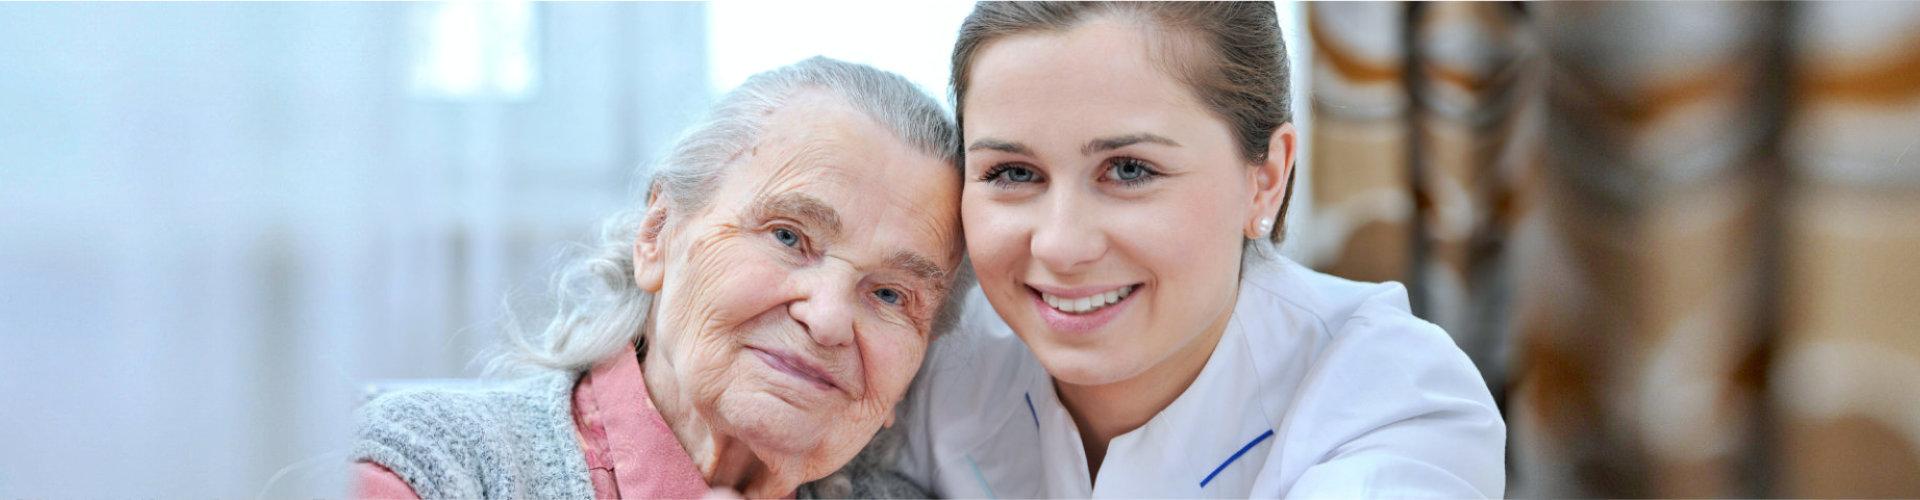 beautiful caregiver and senior woman smiling